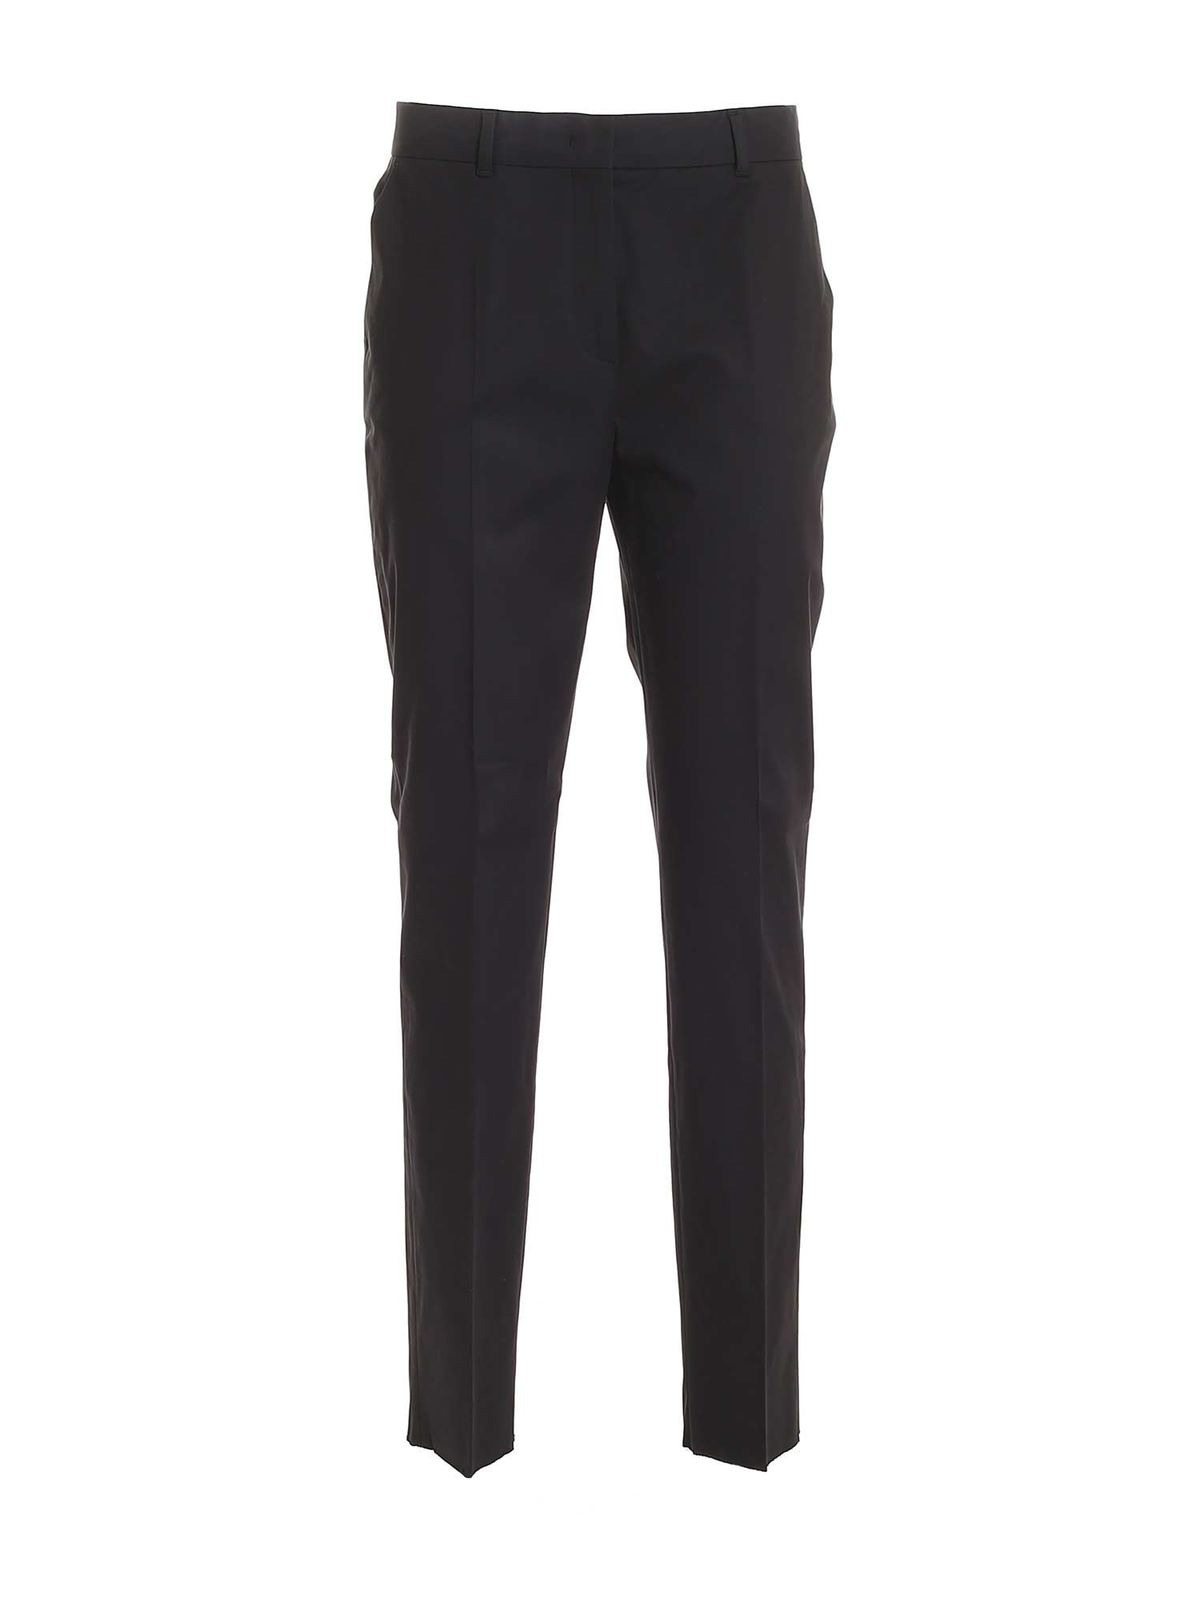 Max Mara Nichel Pants In Black